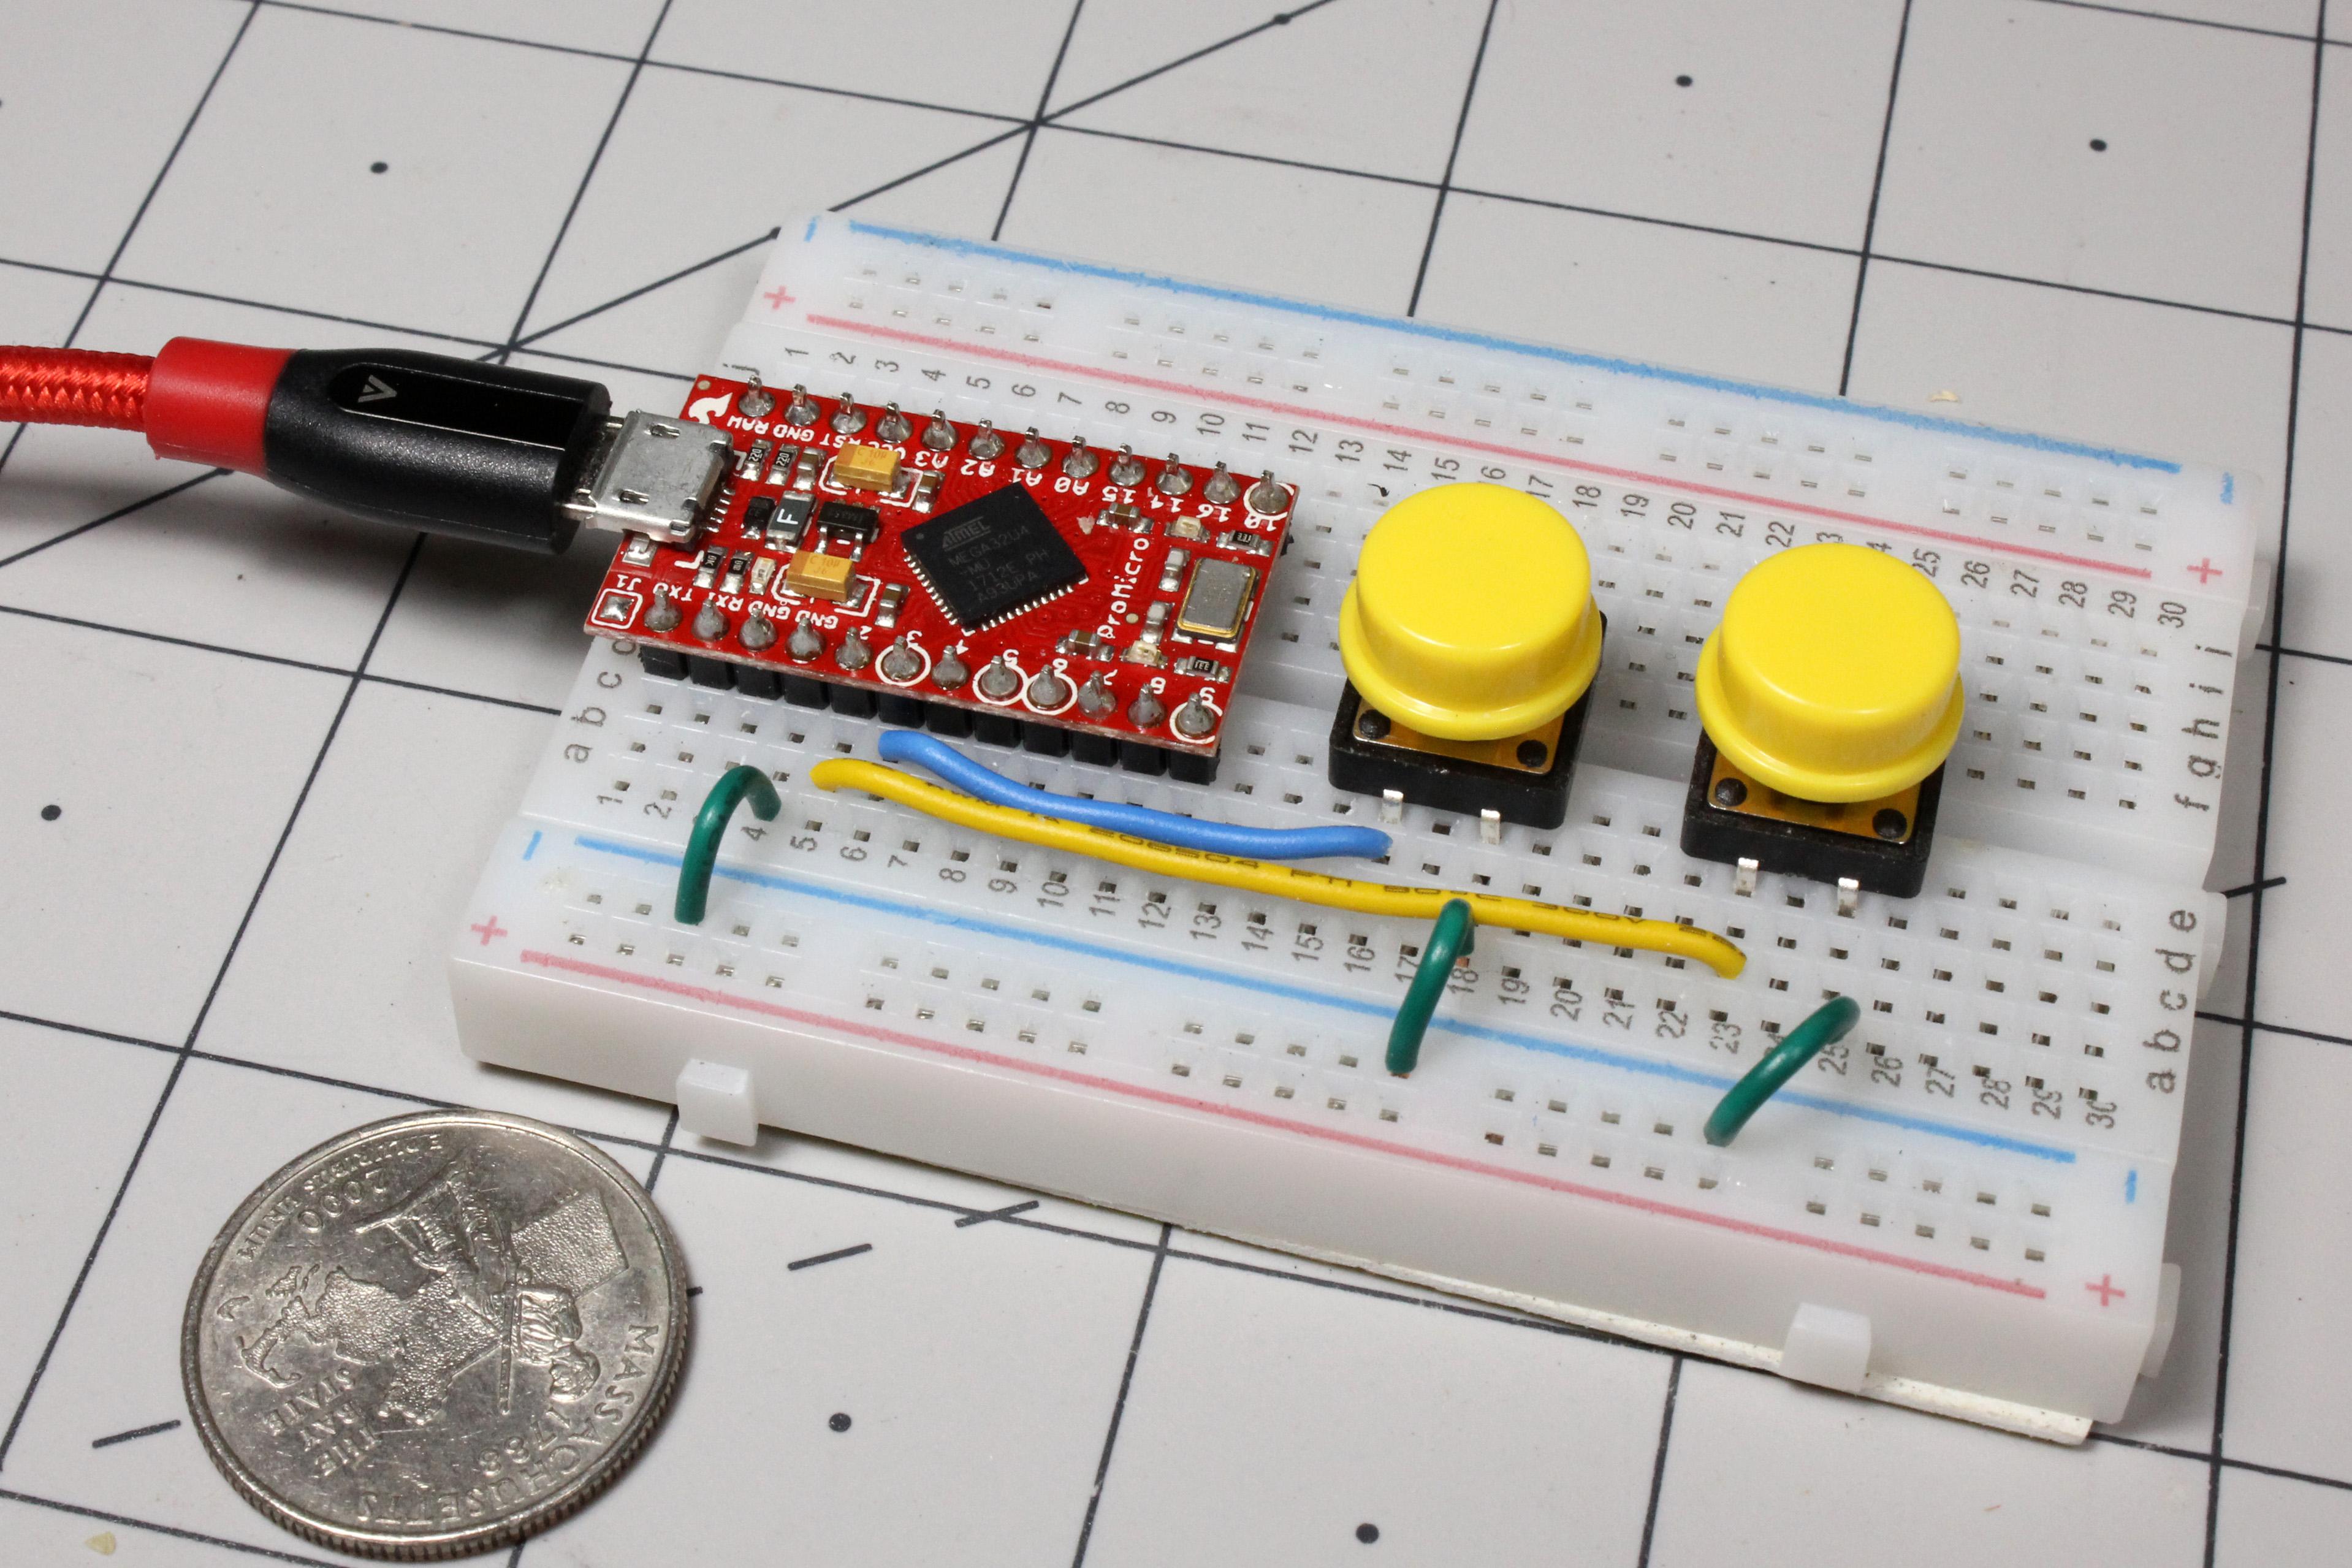 How to create custom shortcut keys with Arduino